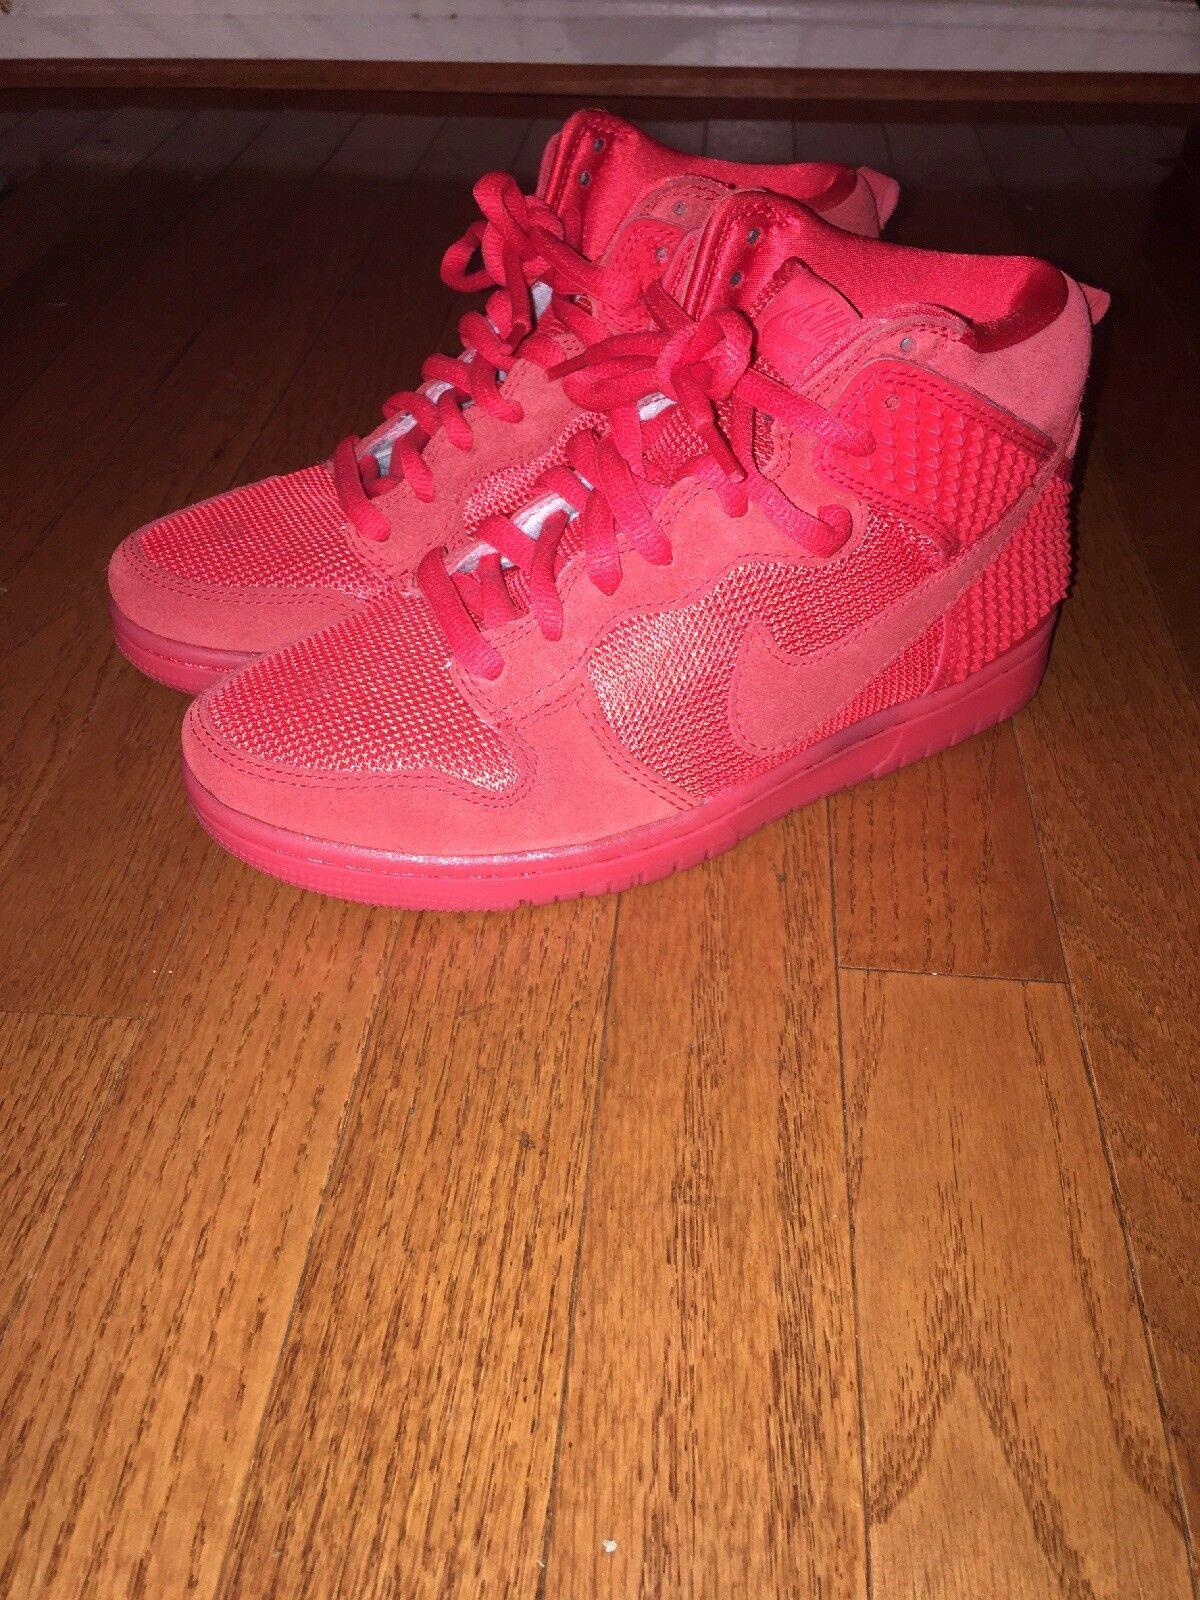 Men's Nike Dunk CMFT Premium Red October 705433-601 Light Crimson Shoes Size 6.5